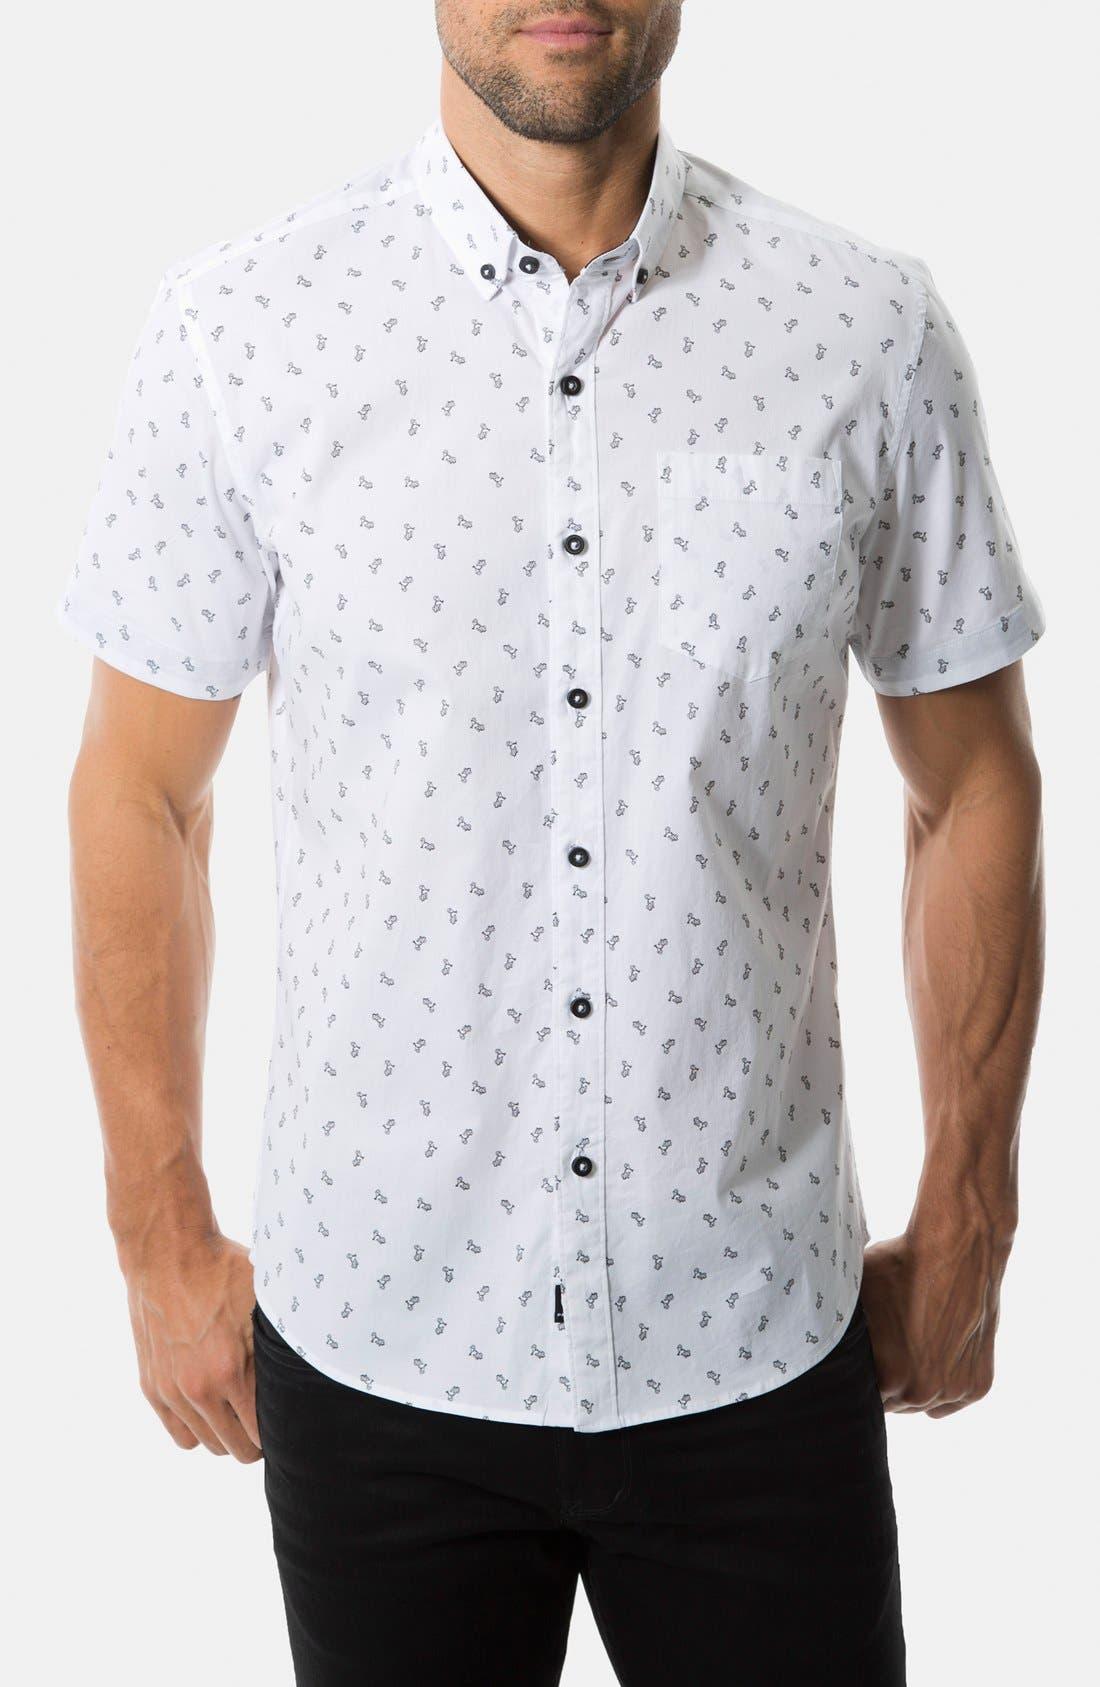 Alternate Image 1 Selected - 7 Diamonds 'Keep Moving' Short Sleeve Print Sport Shirt